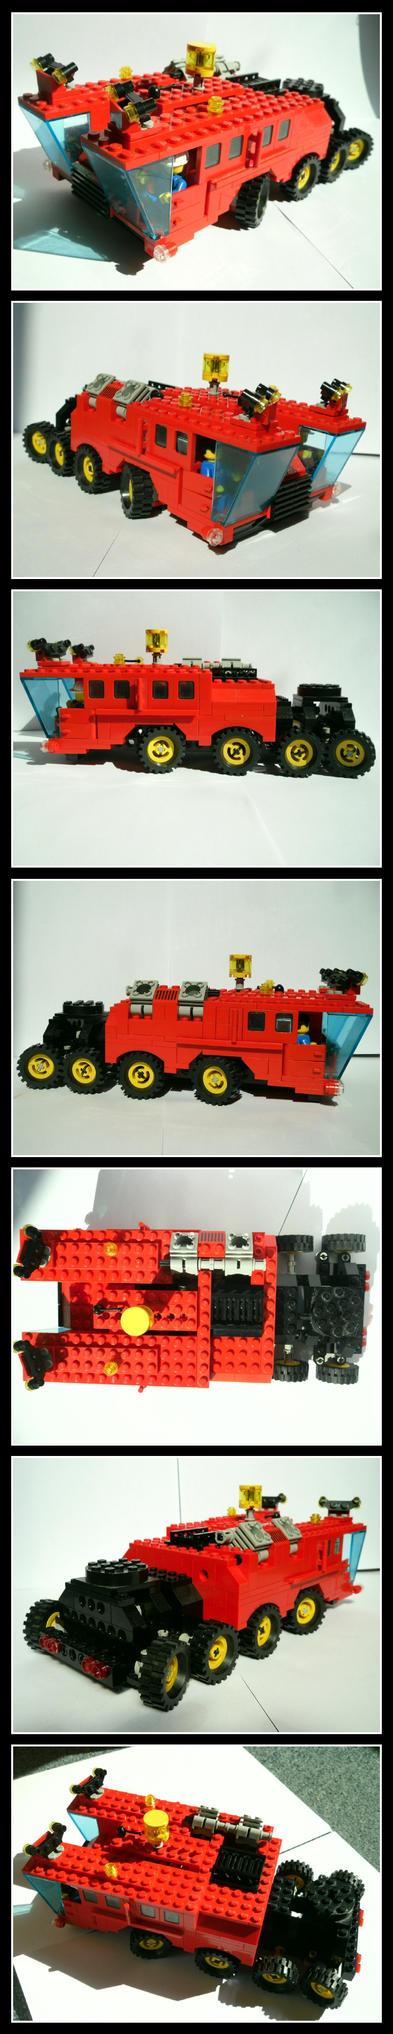 Zugmaschine by Lemniskate